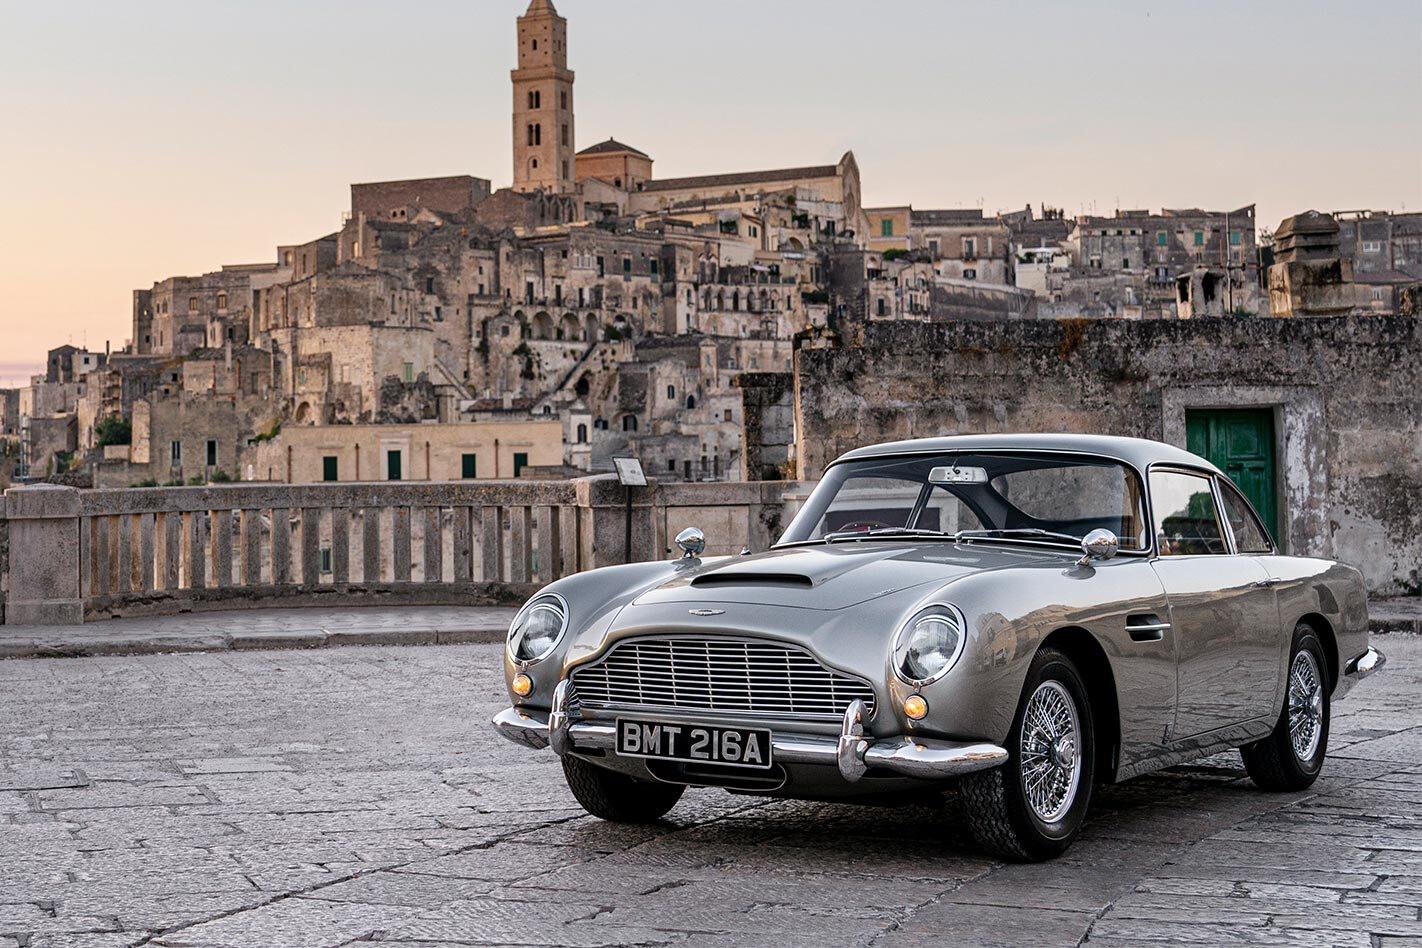 Bond No Time to Die Aston Martin DB5